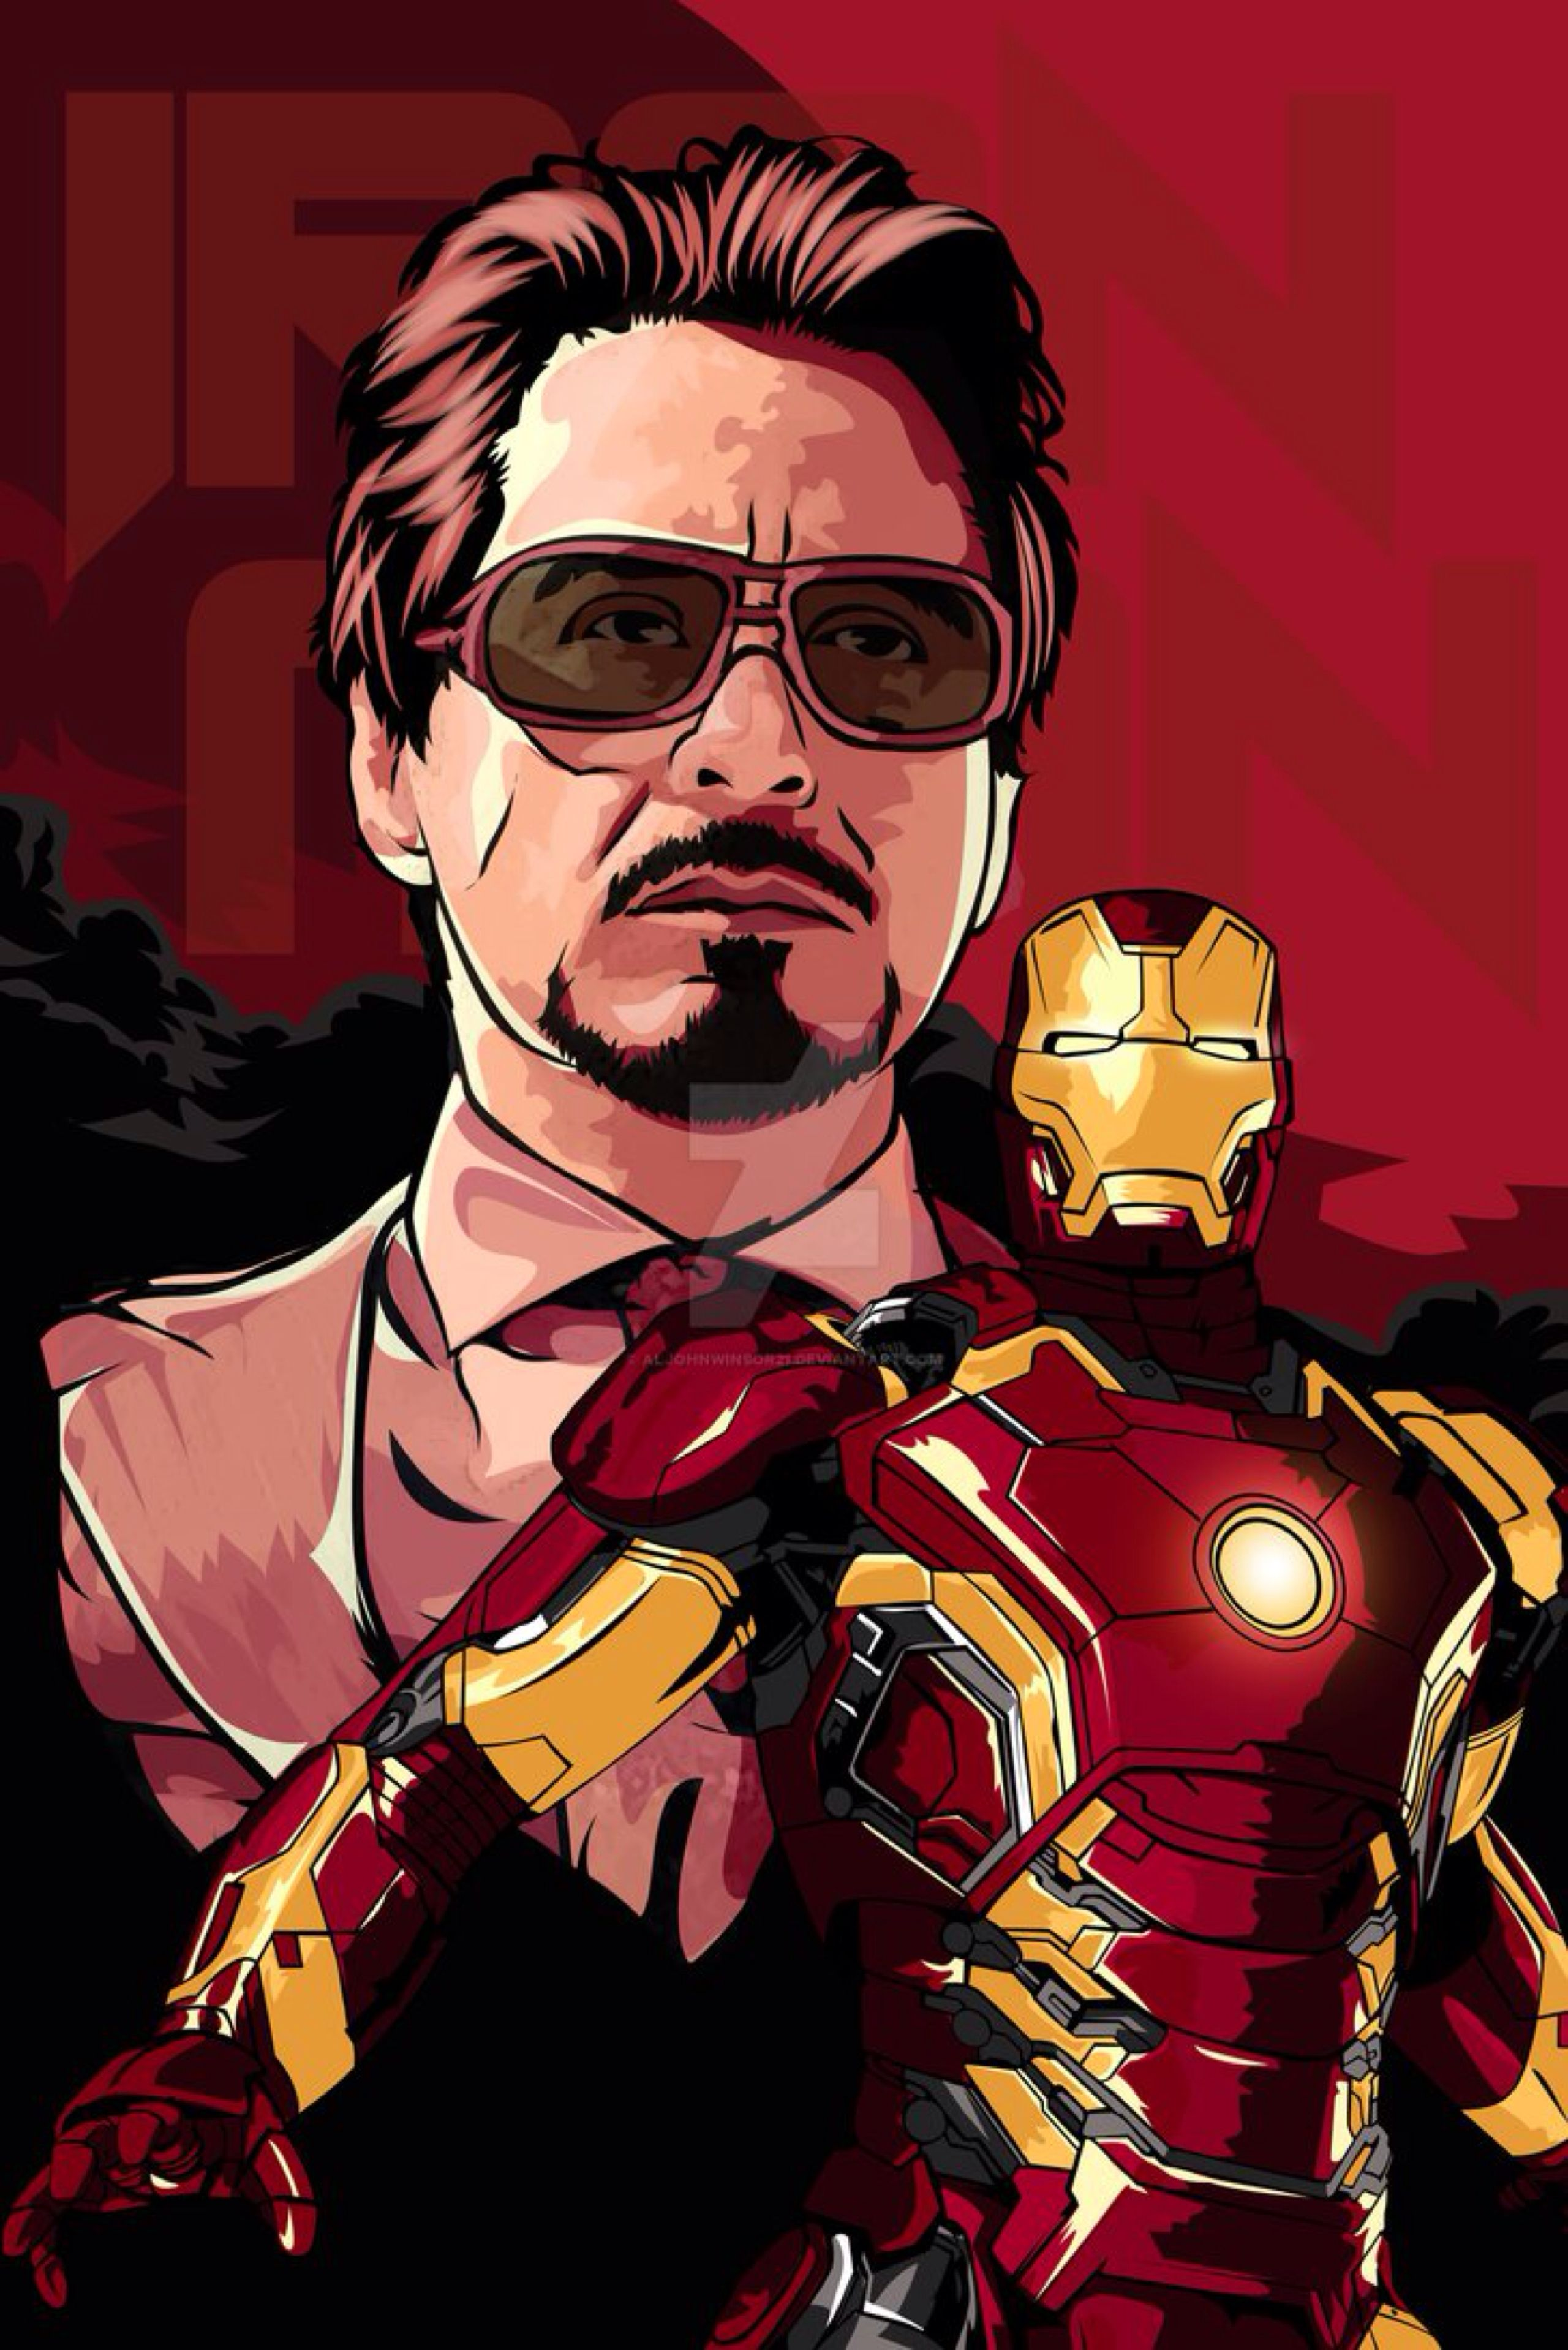 I Love You 3000 By Aljohnwinsor21 On Deviantart Iron Man Fan Art I Love You 3000 I Love You 3000 Art